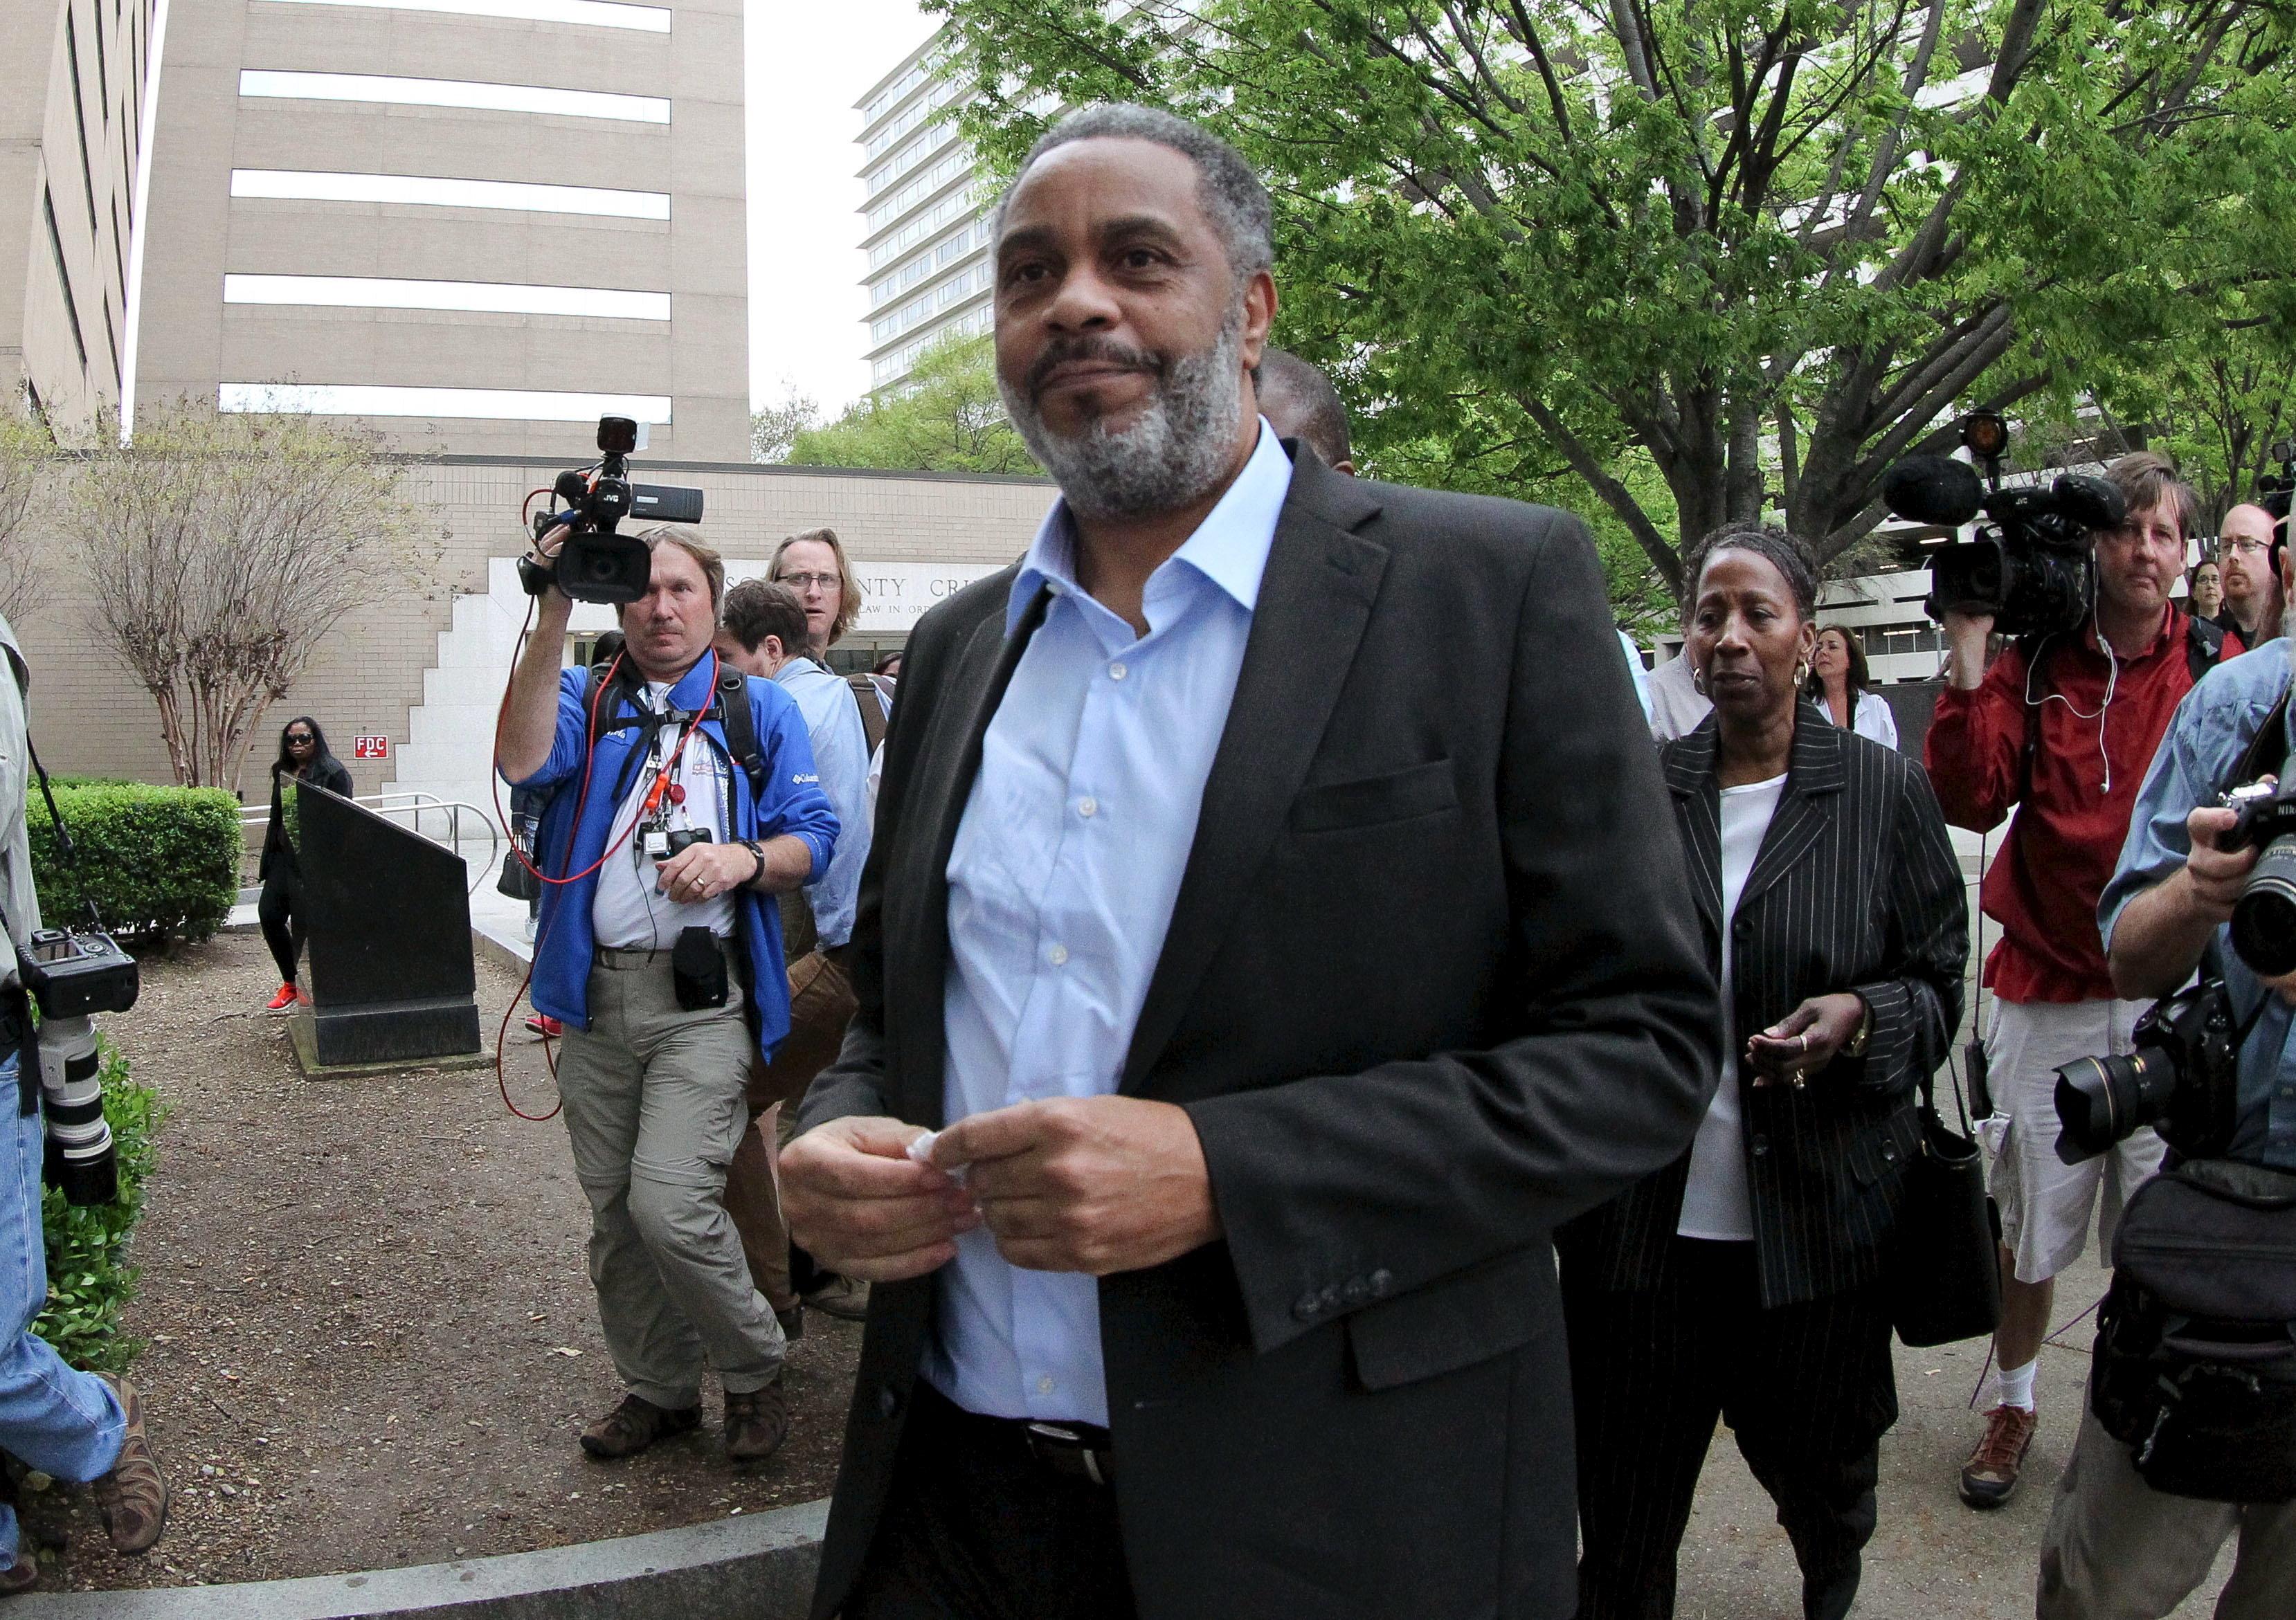 Nach fast 30 Jahren im Todestrakt kam Anthony Ray Hinton 2015